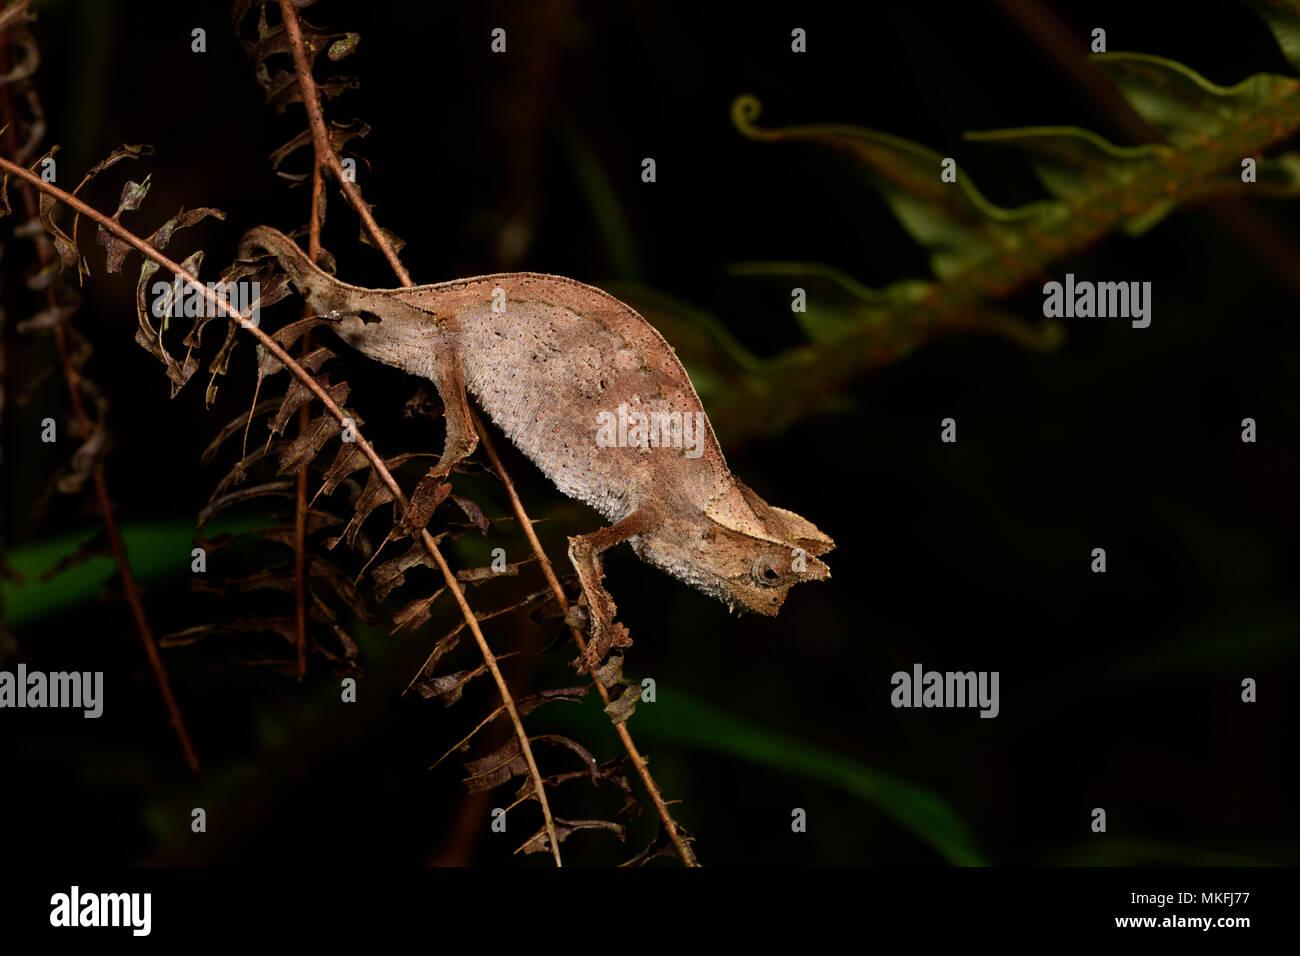 Braun Blatt Chamäleon oder gehörnte Blatt Chameleon (Brookesia superciliaris), Andasibe, Perinet, Alaotra-Mangoro Region, Madagaskar Stockbild